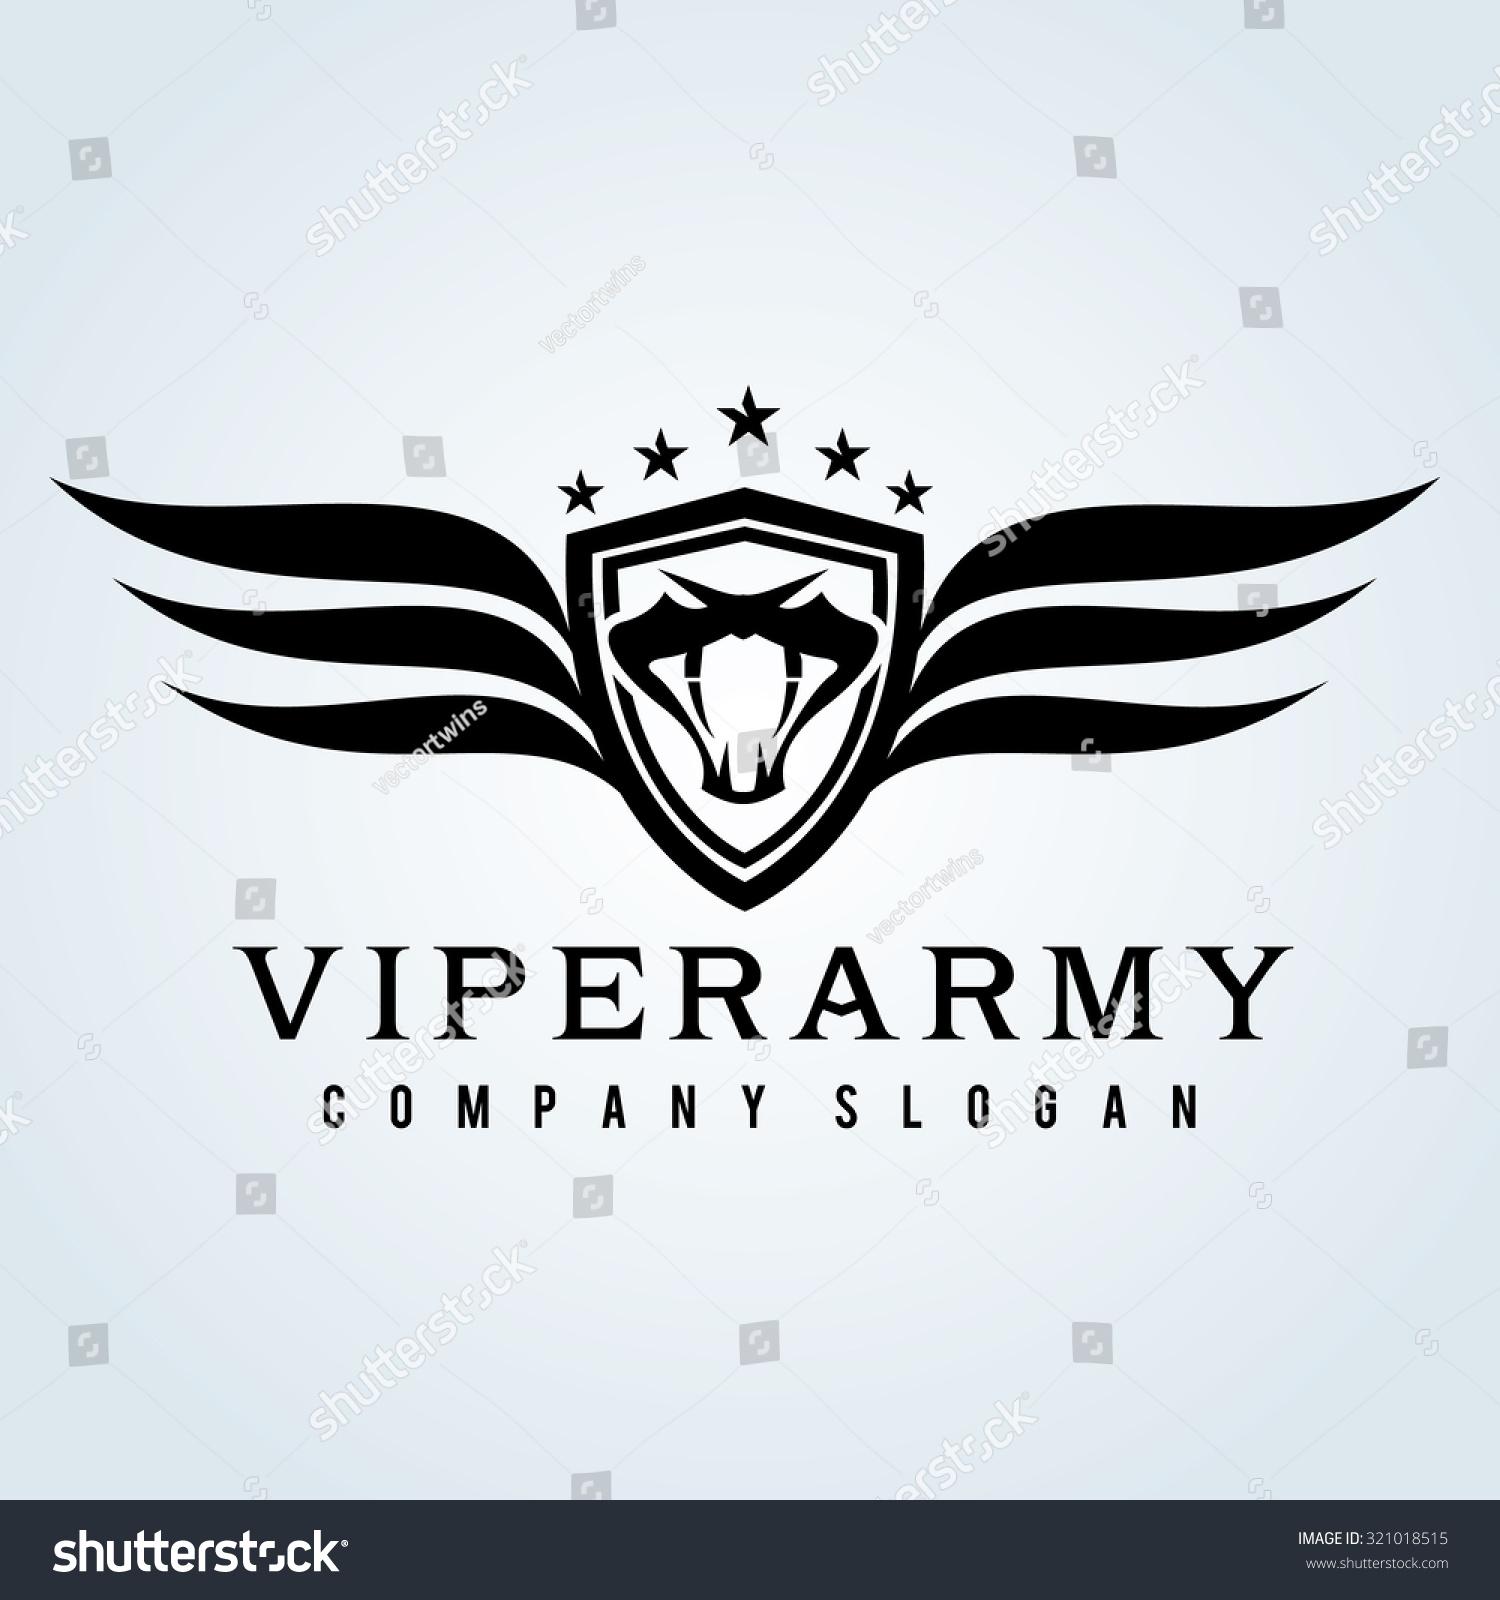 viper armysnake logocrest logocobra logovector logo stock vector 321018515 shutterstock. Black Bedroom Furniture Sets. Home Design Ideas